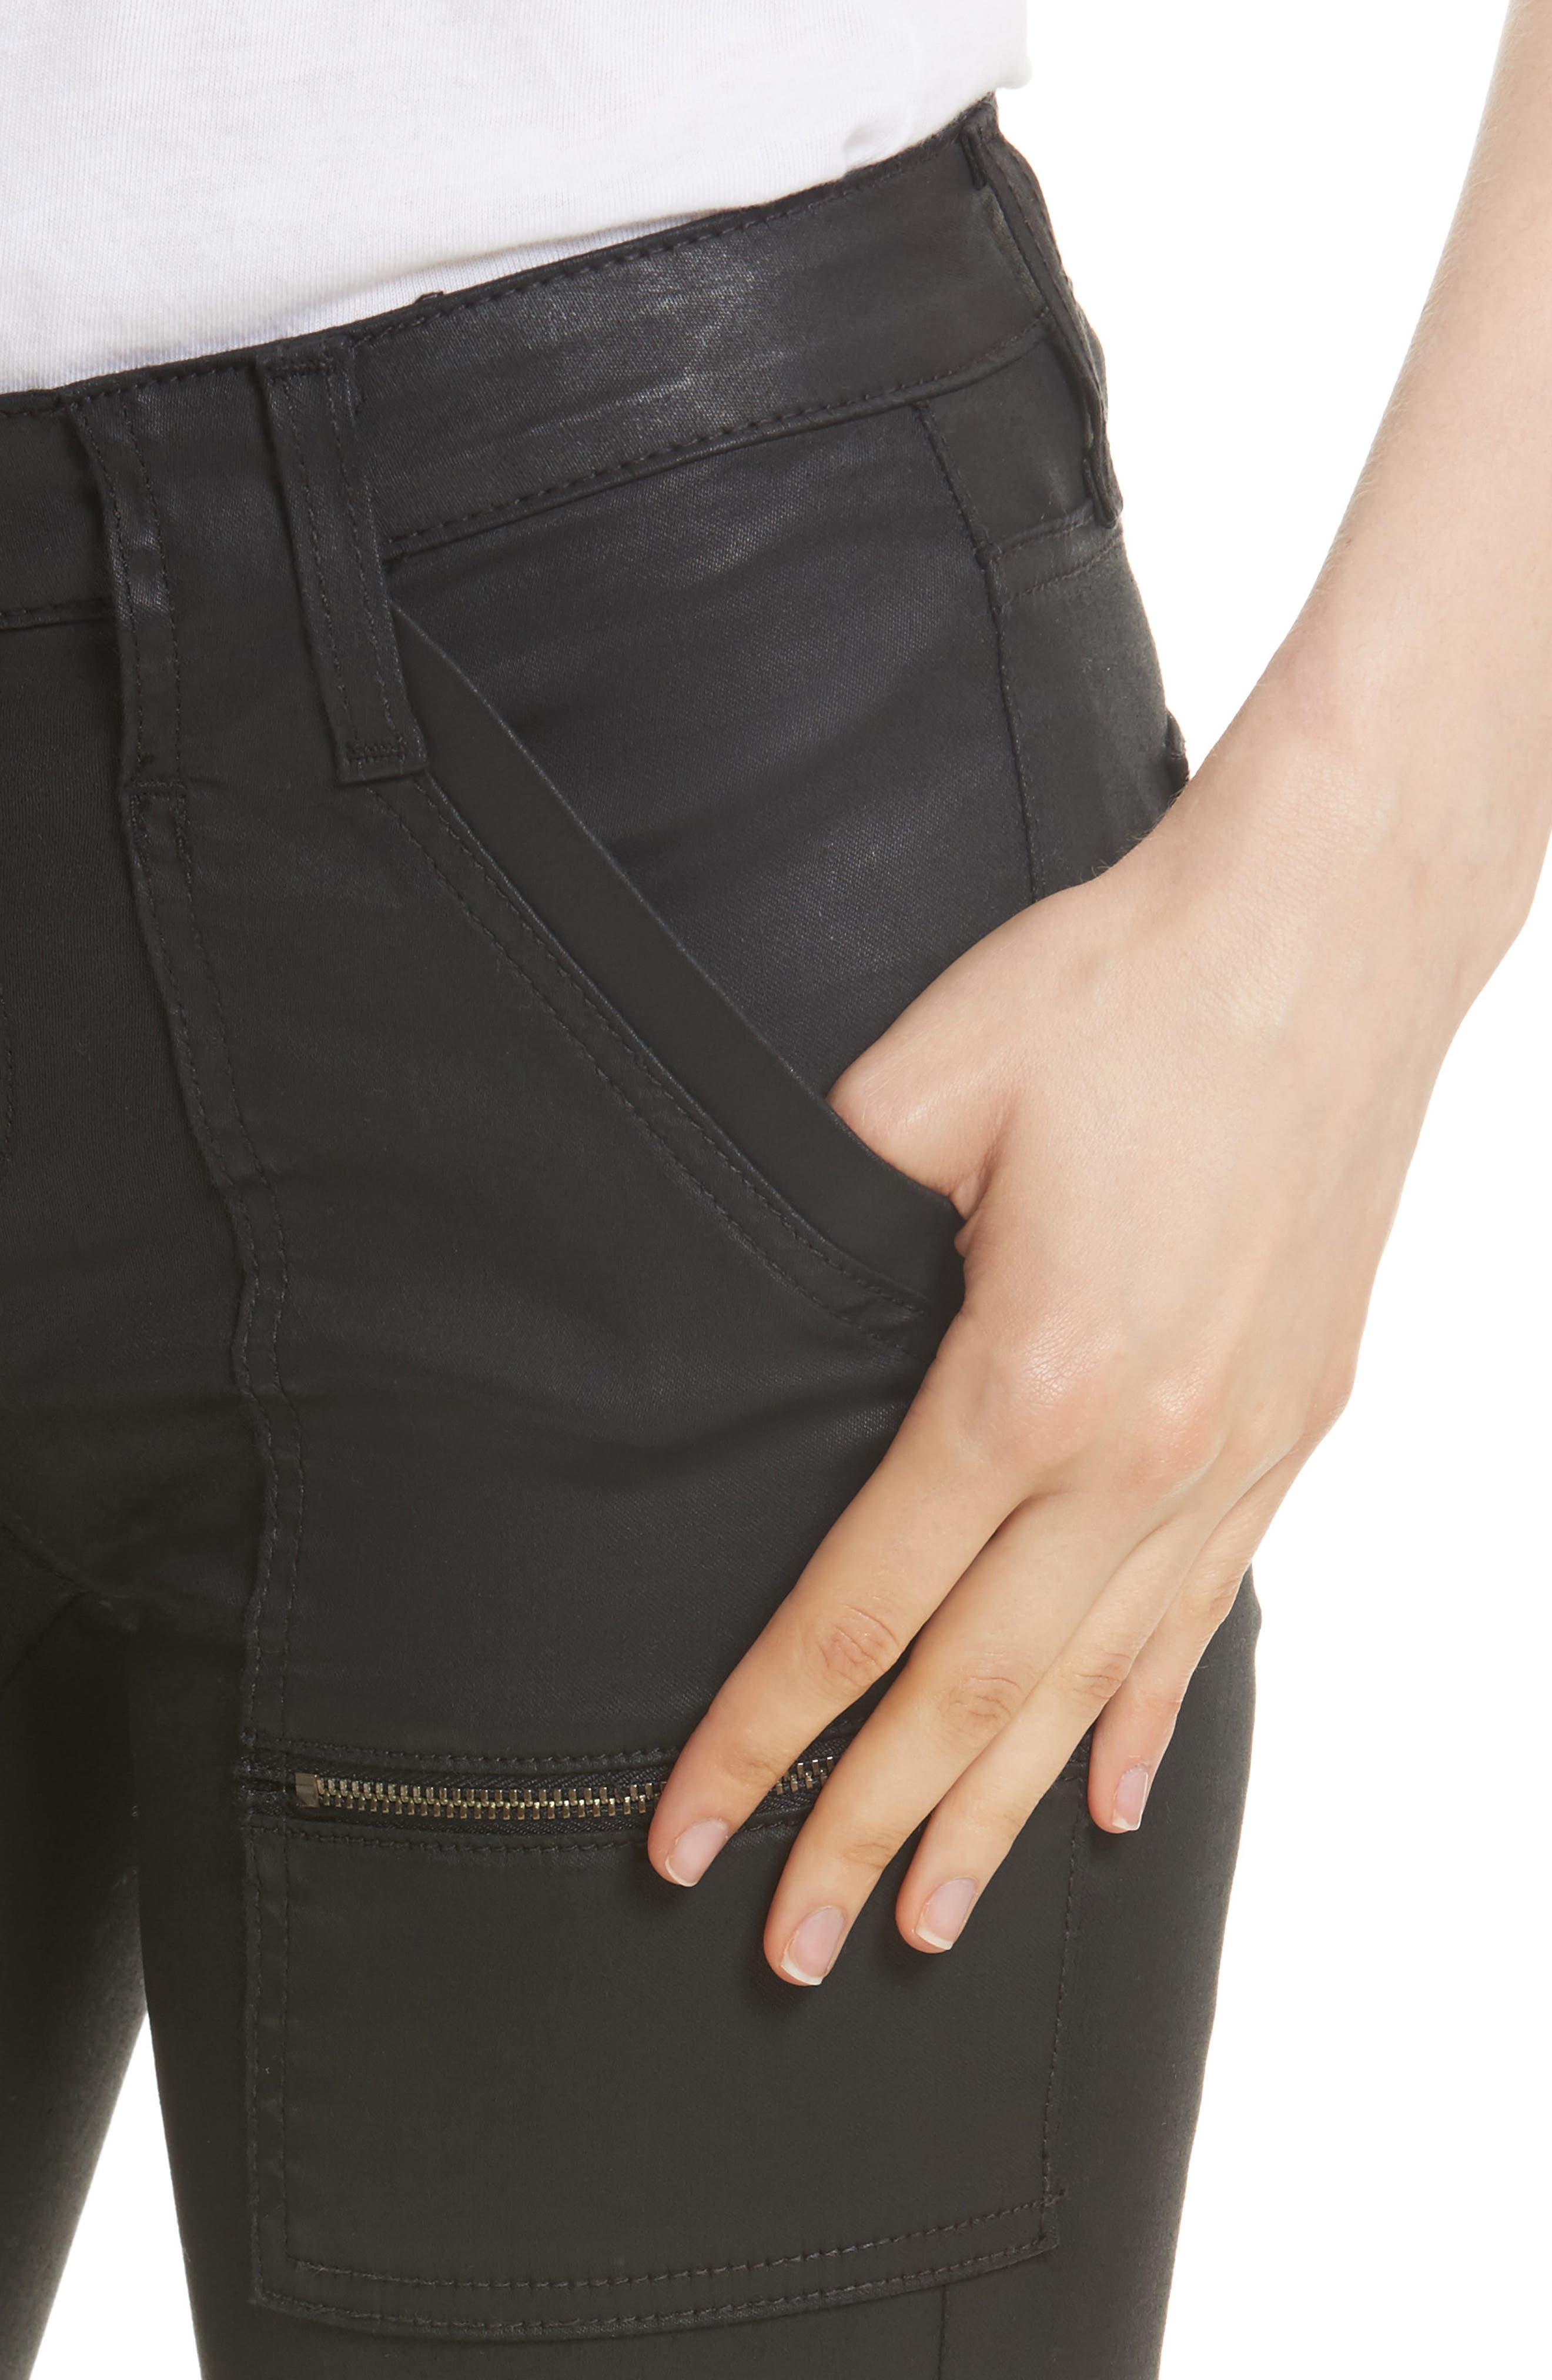 Park B Coated Skinny Jeans,                             Alternate thumbnail 4, color,                             Caviar